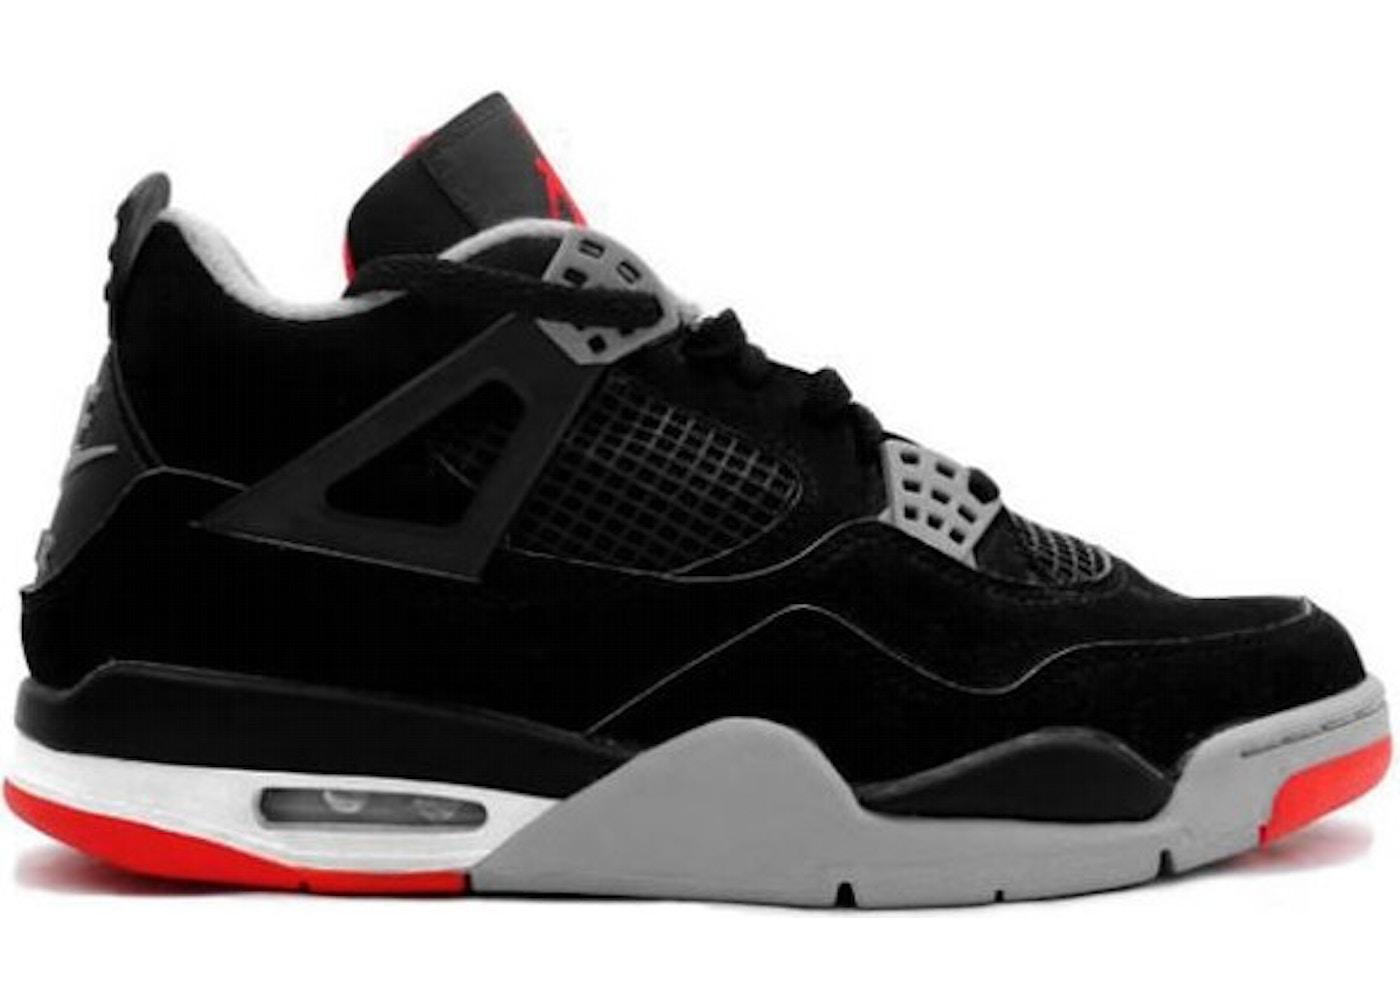 Jordan 4 OG Black Cement (1989) - 4363 ad375584a